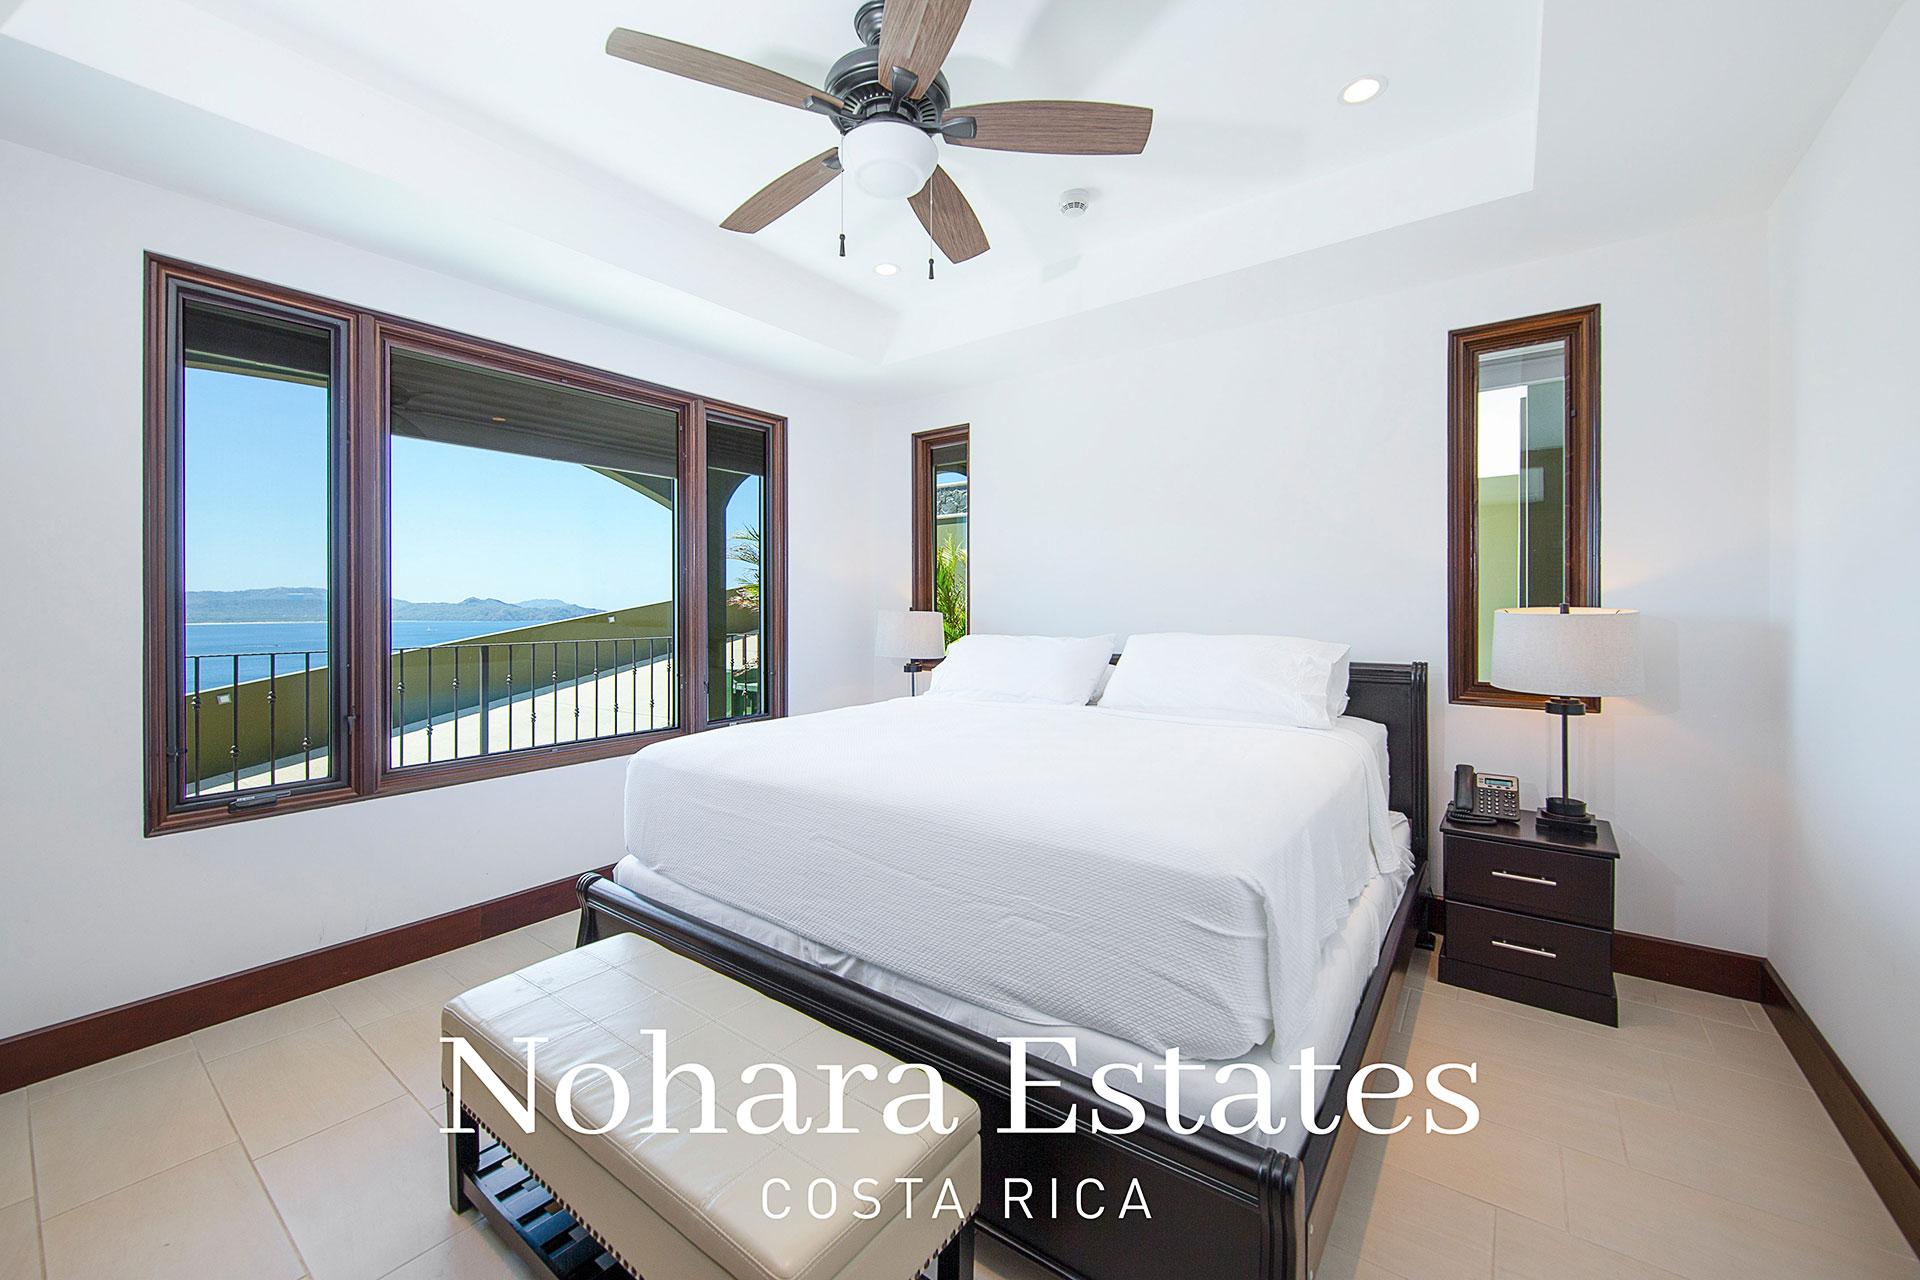 Nohara Estates Costa Rica 360 Esplendor Del Pacifico 101 5